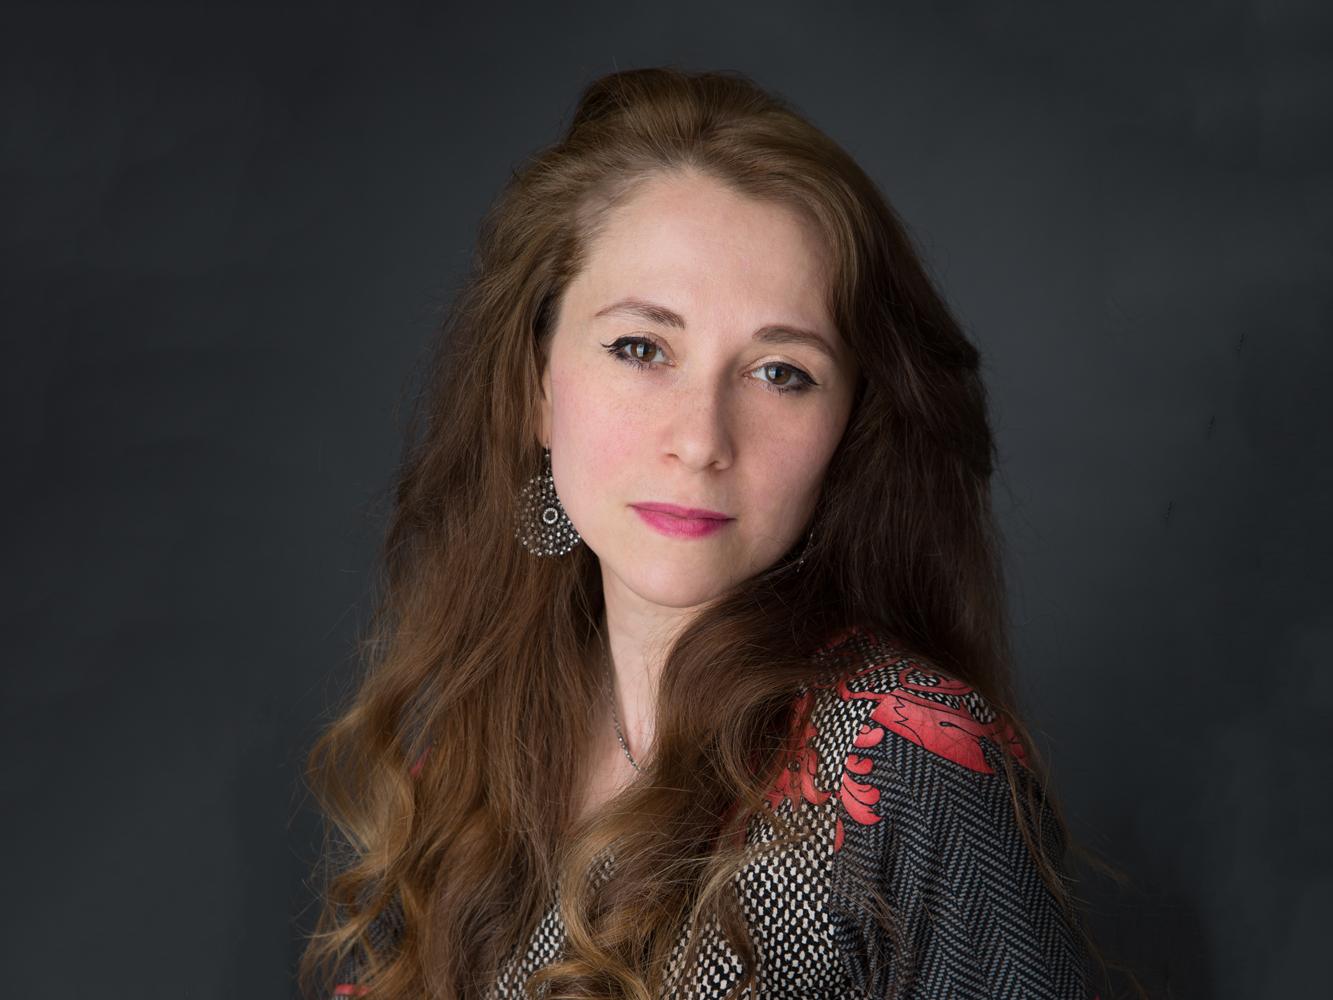 breastmilk-jewelry-anna-profile